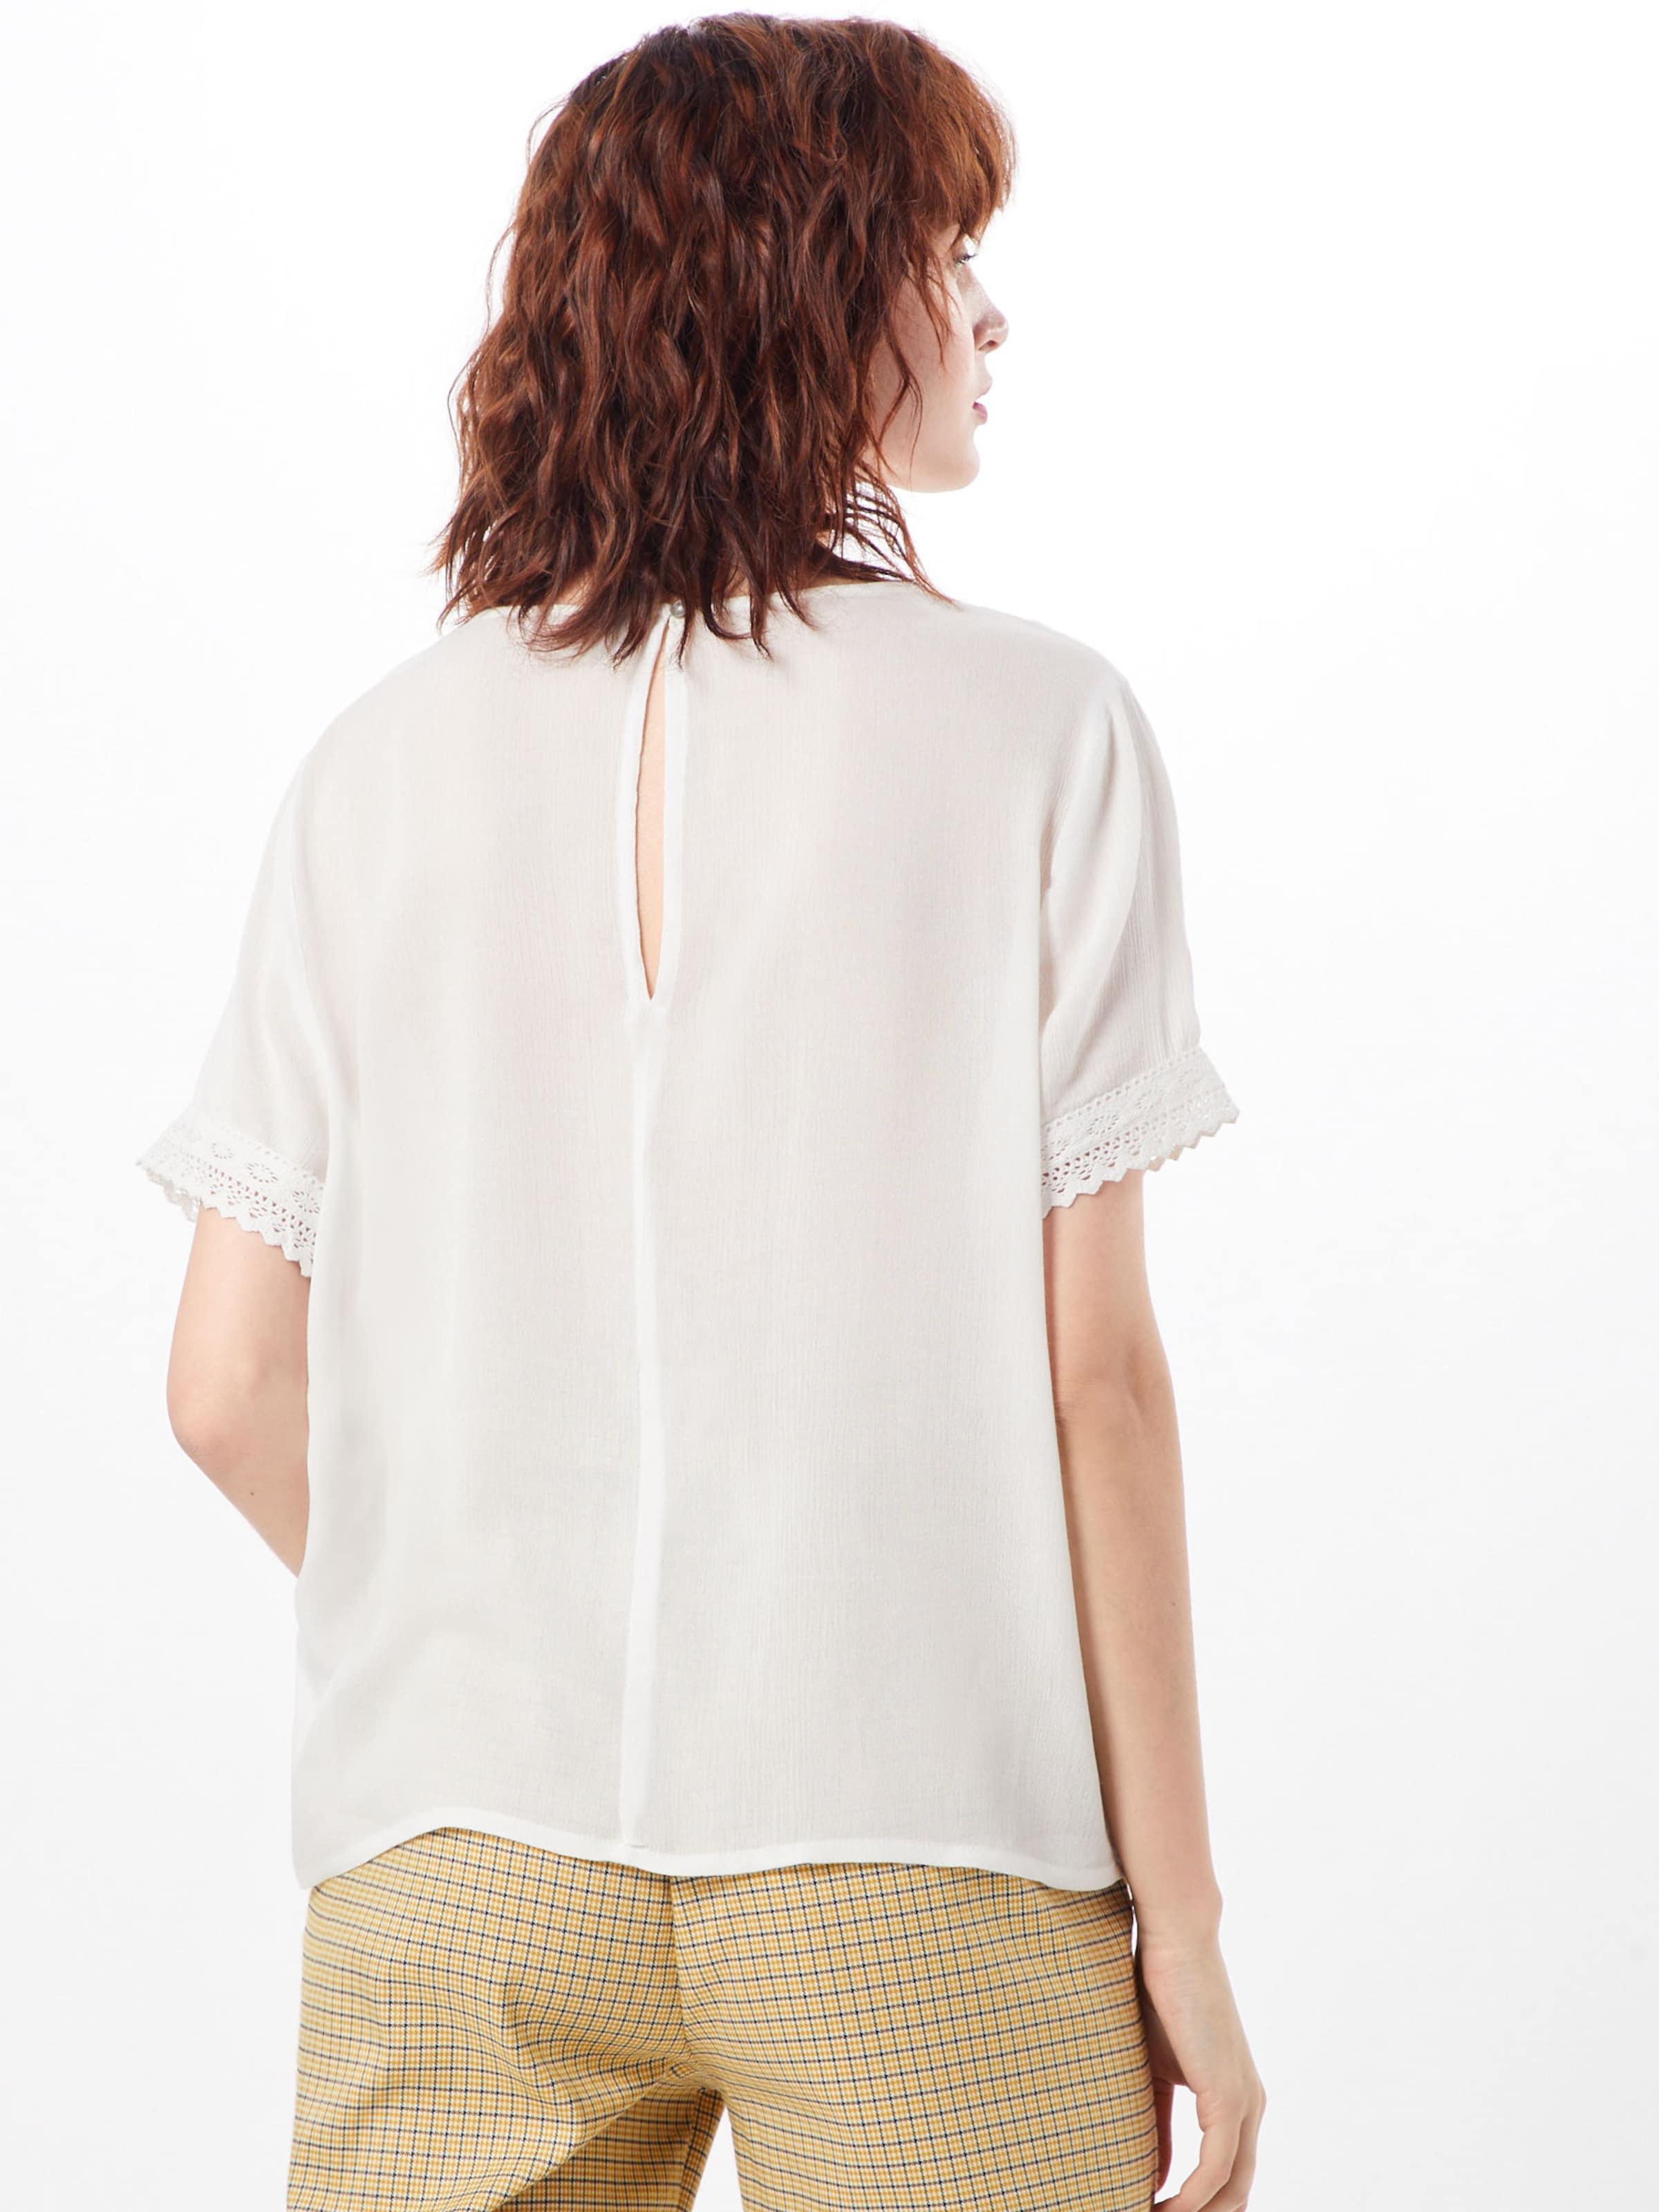 Jacqueline Yong 'june' De Shirt In Weiß nwOPk0